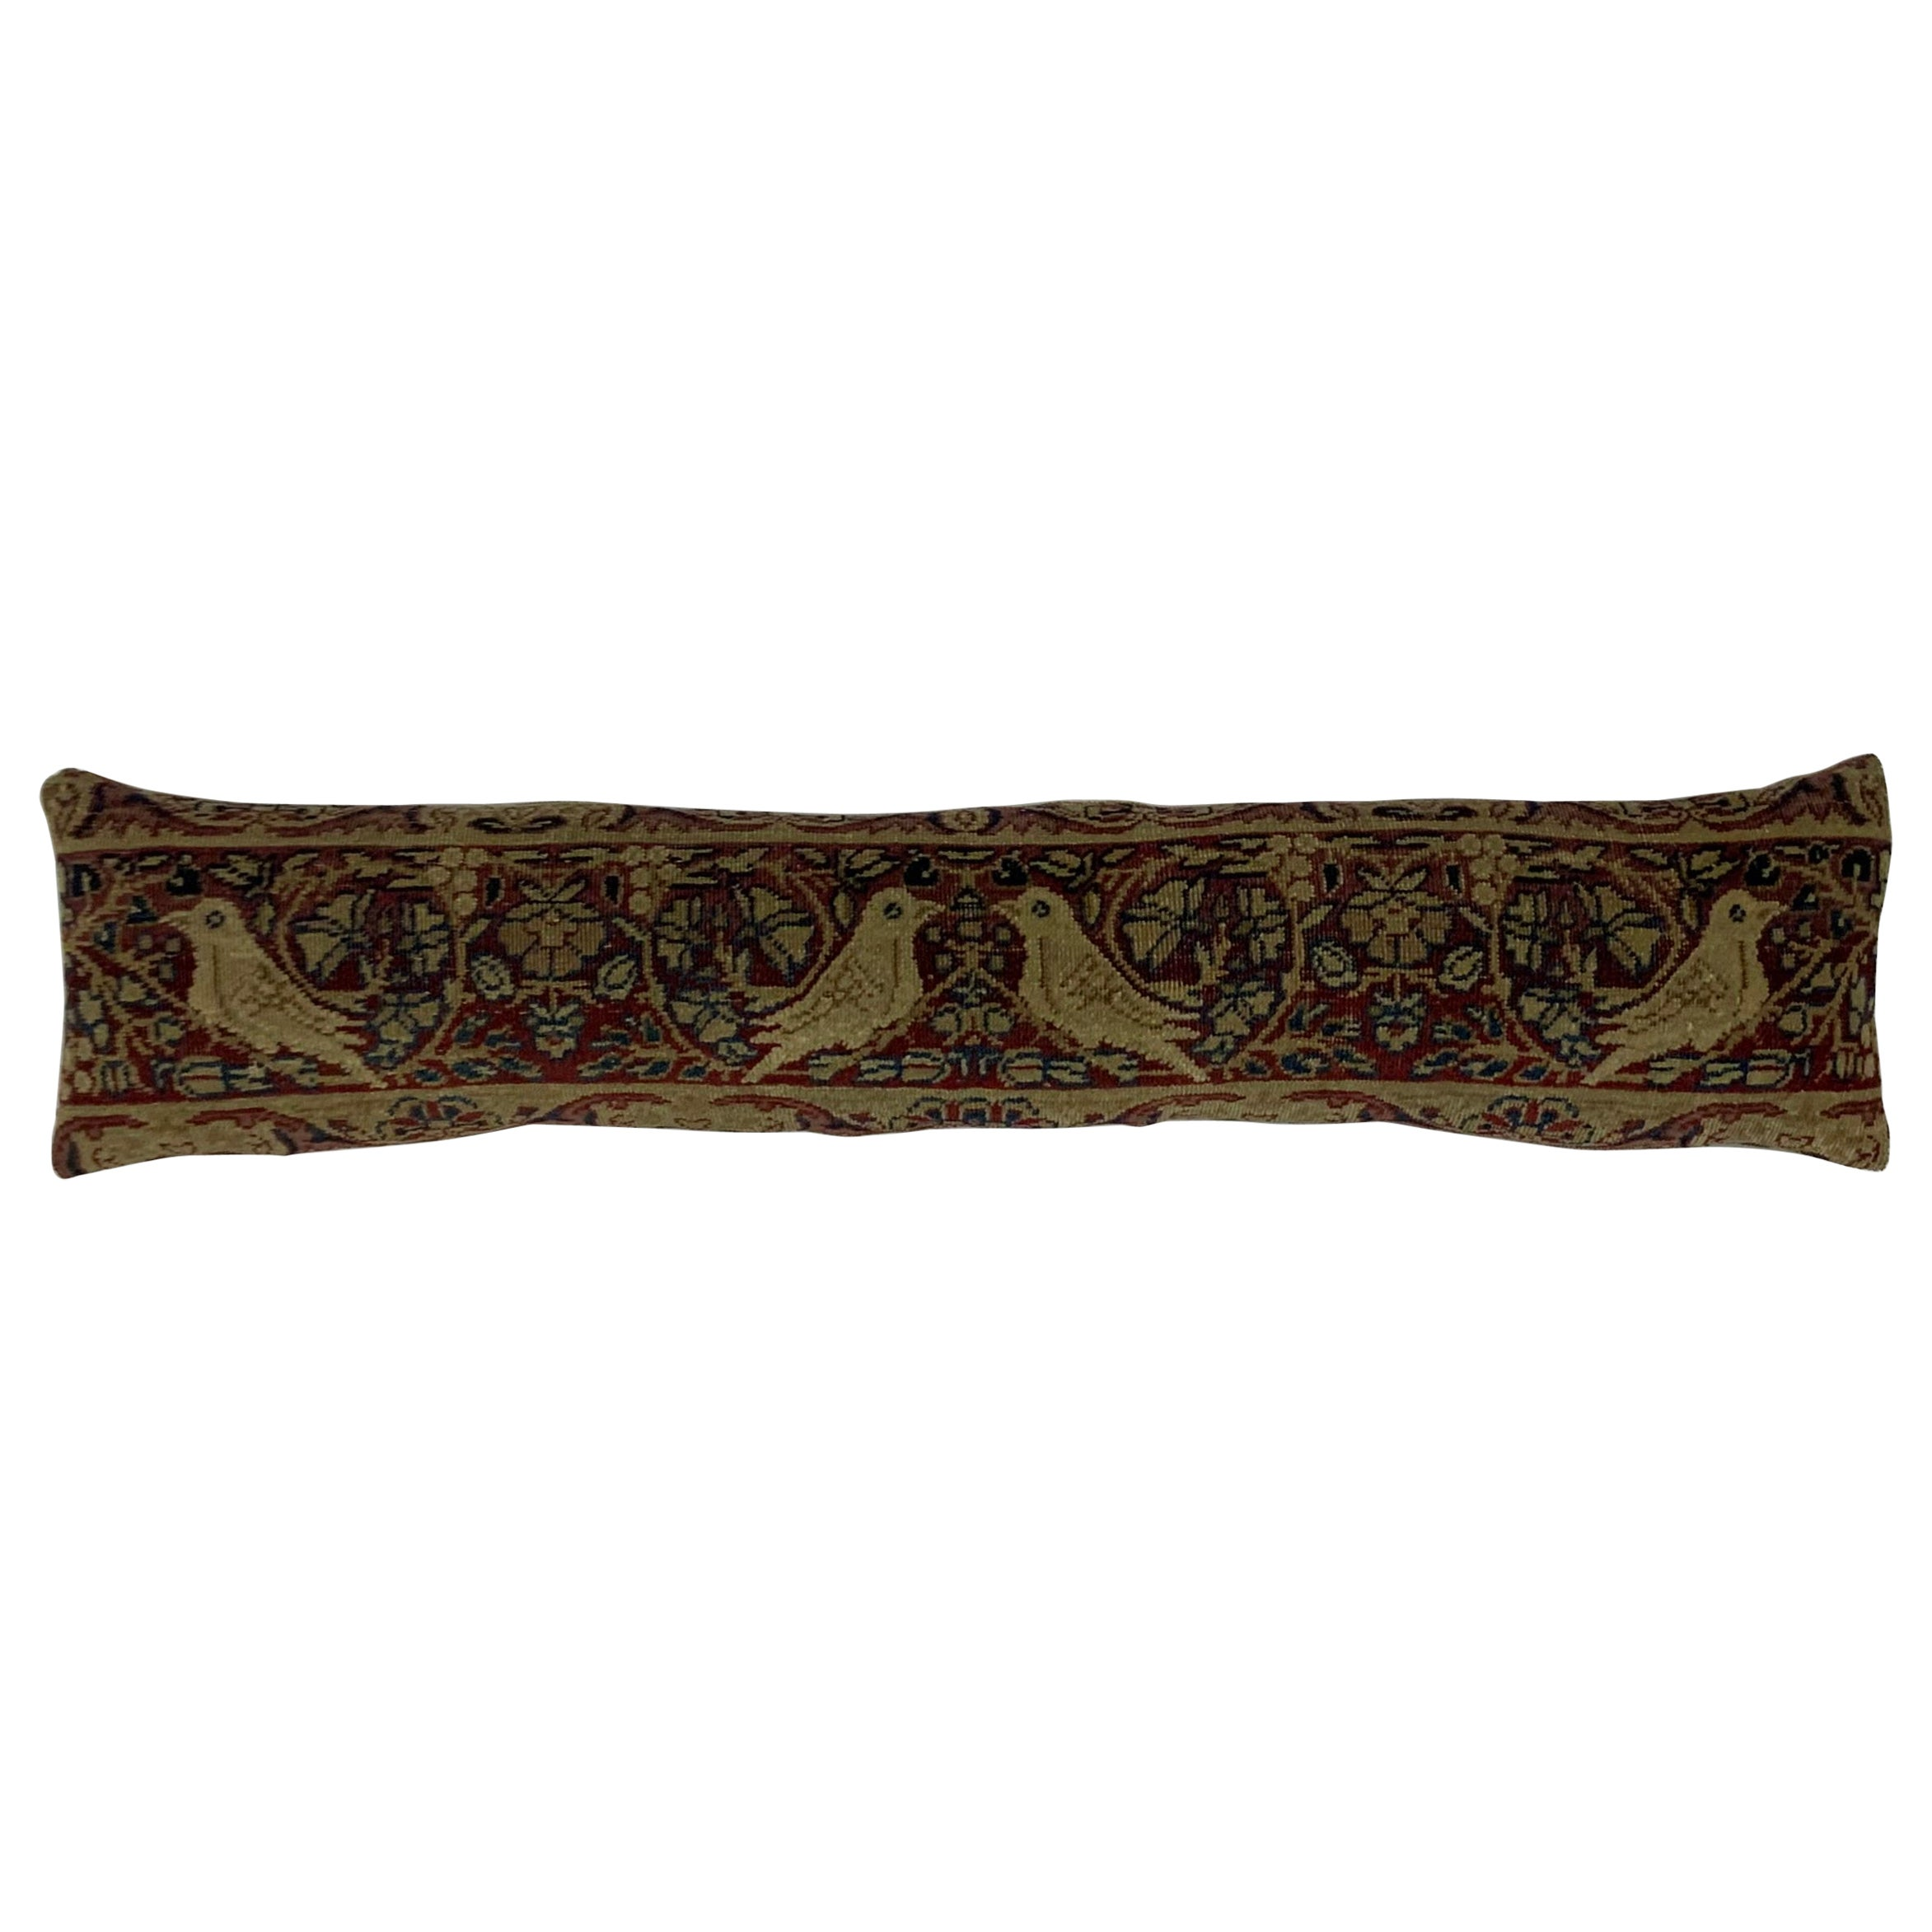 Antique Hand Woven Pictorial Hand Woven Pillow